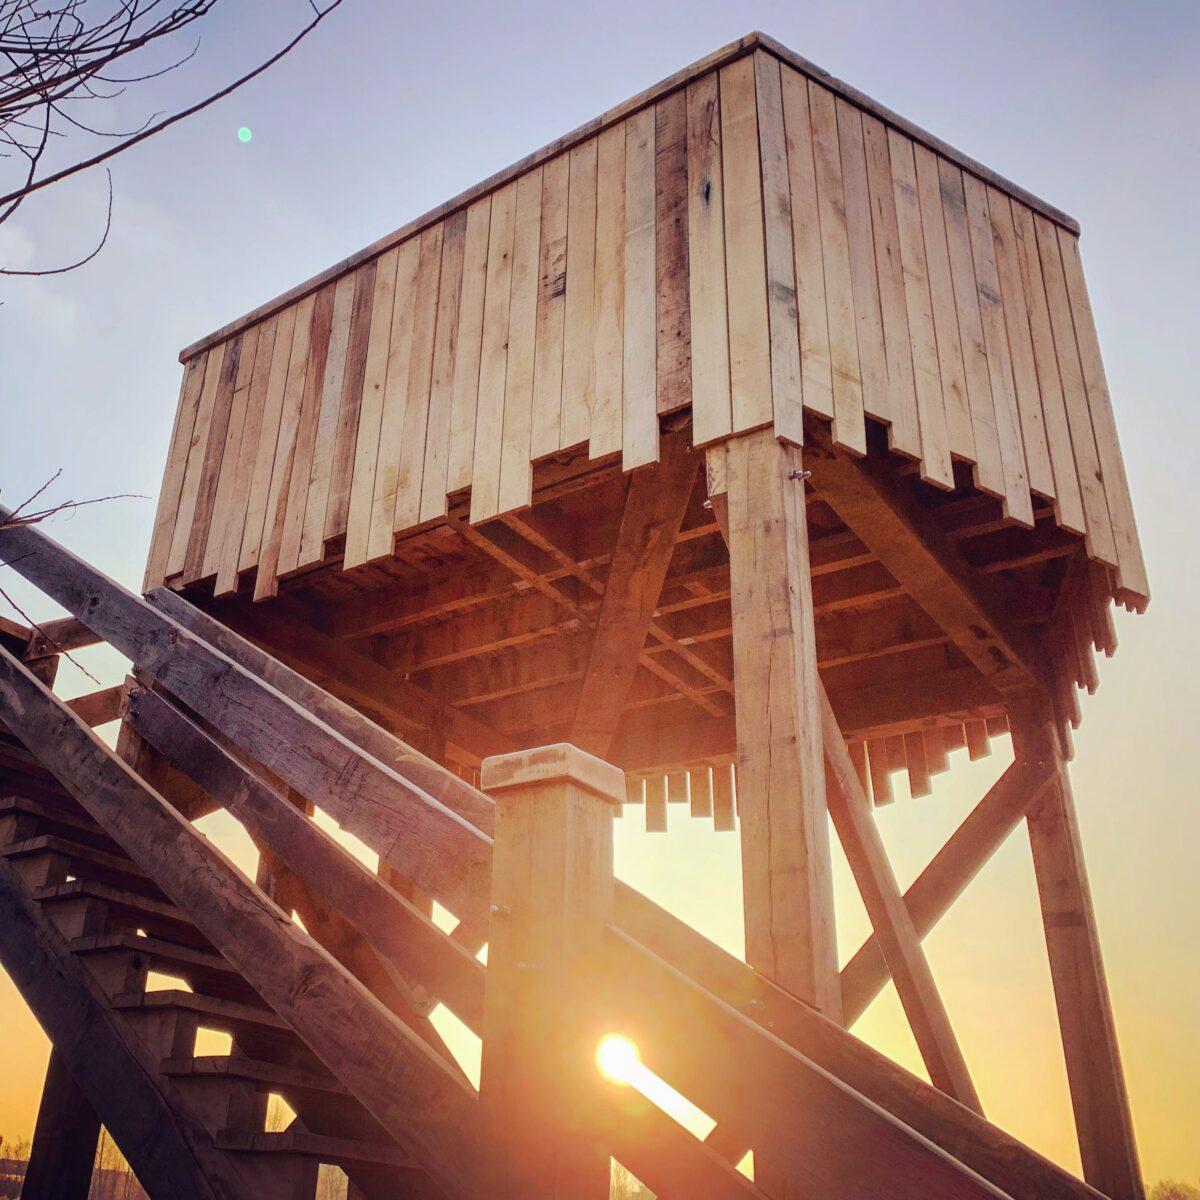 Uitkijktoren Tommelen